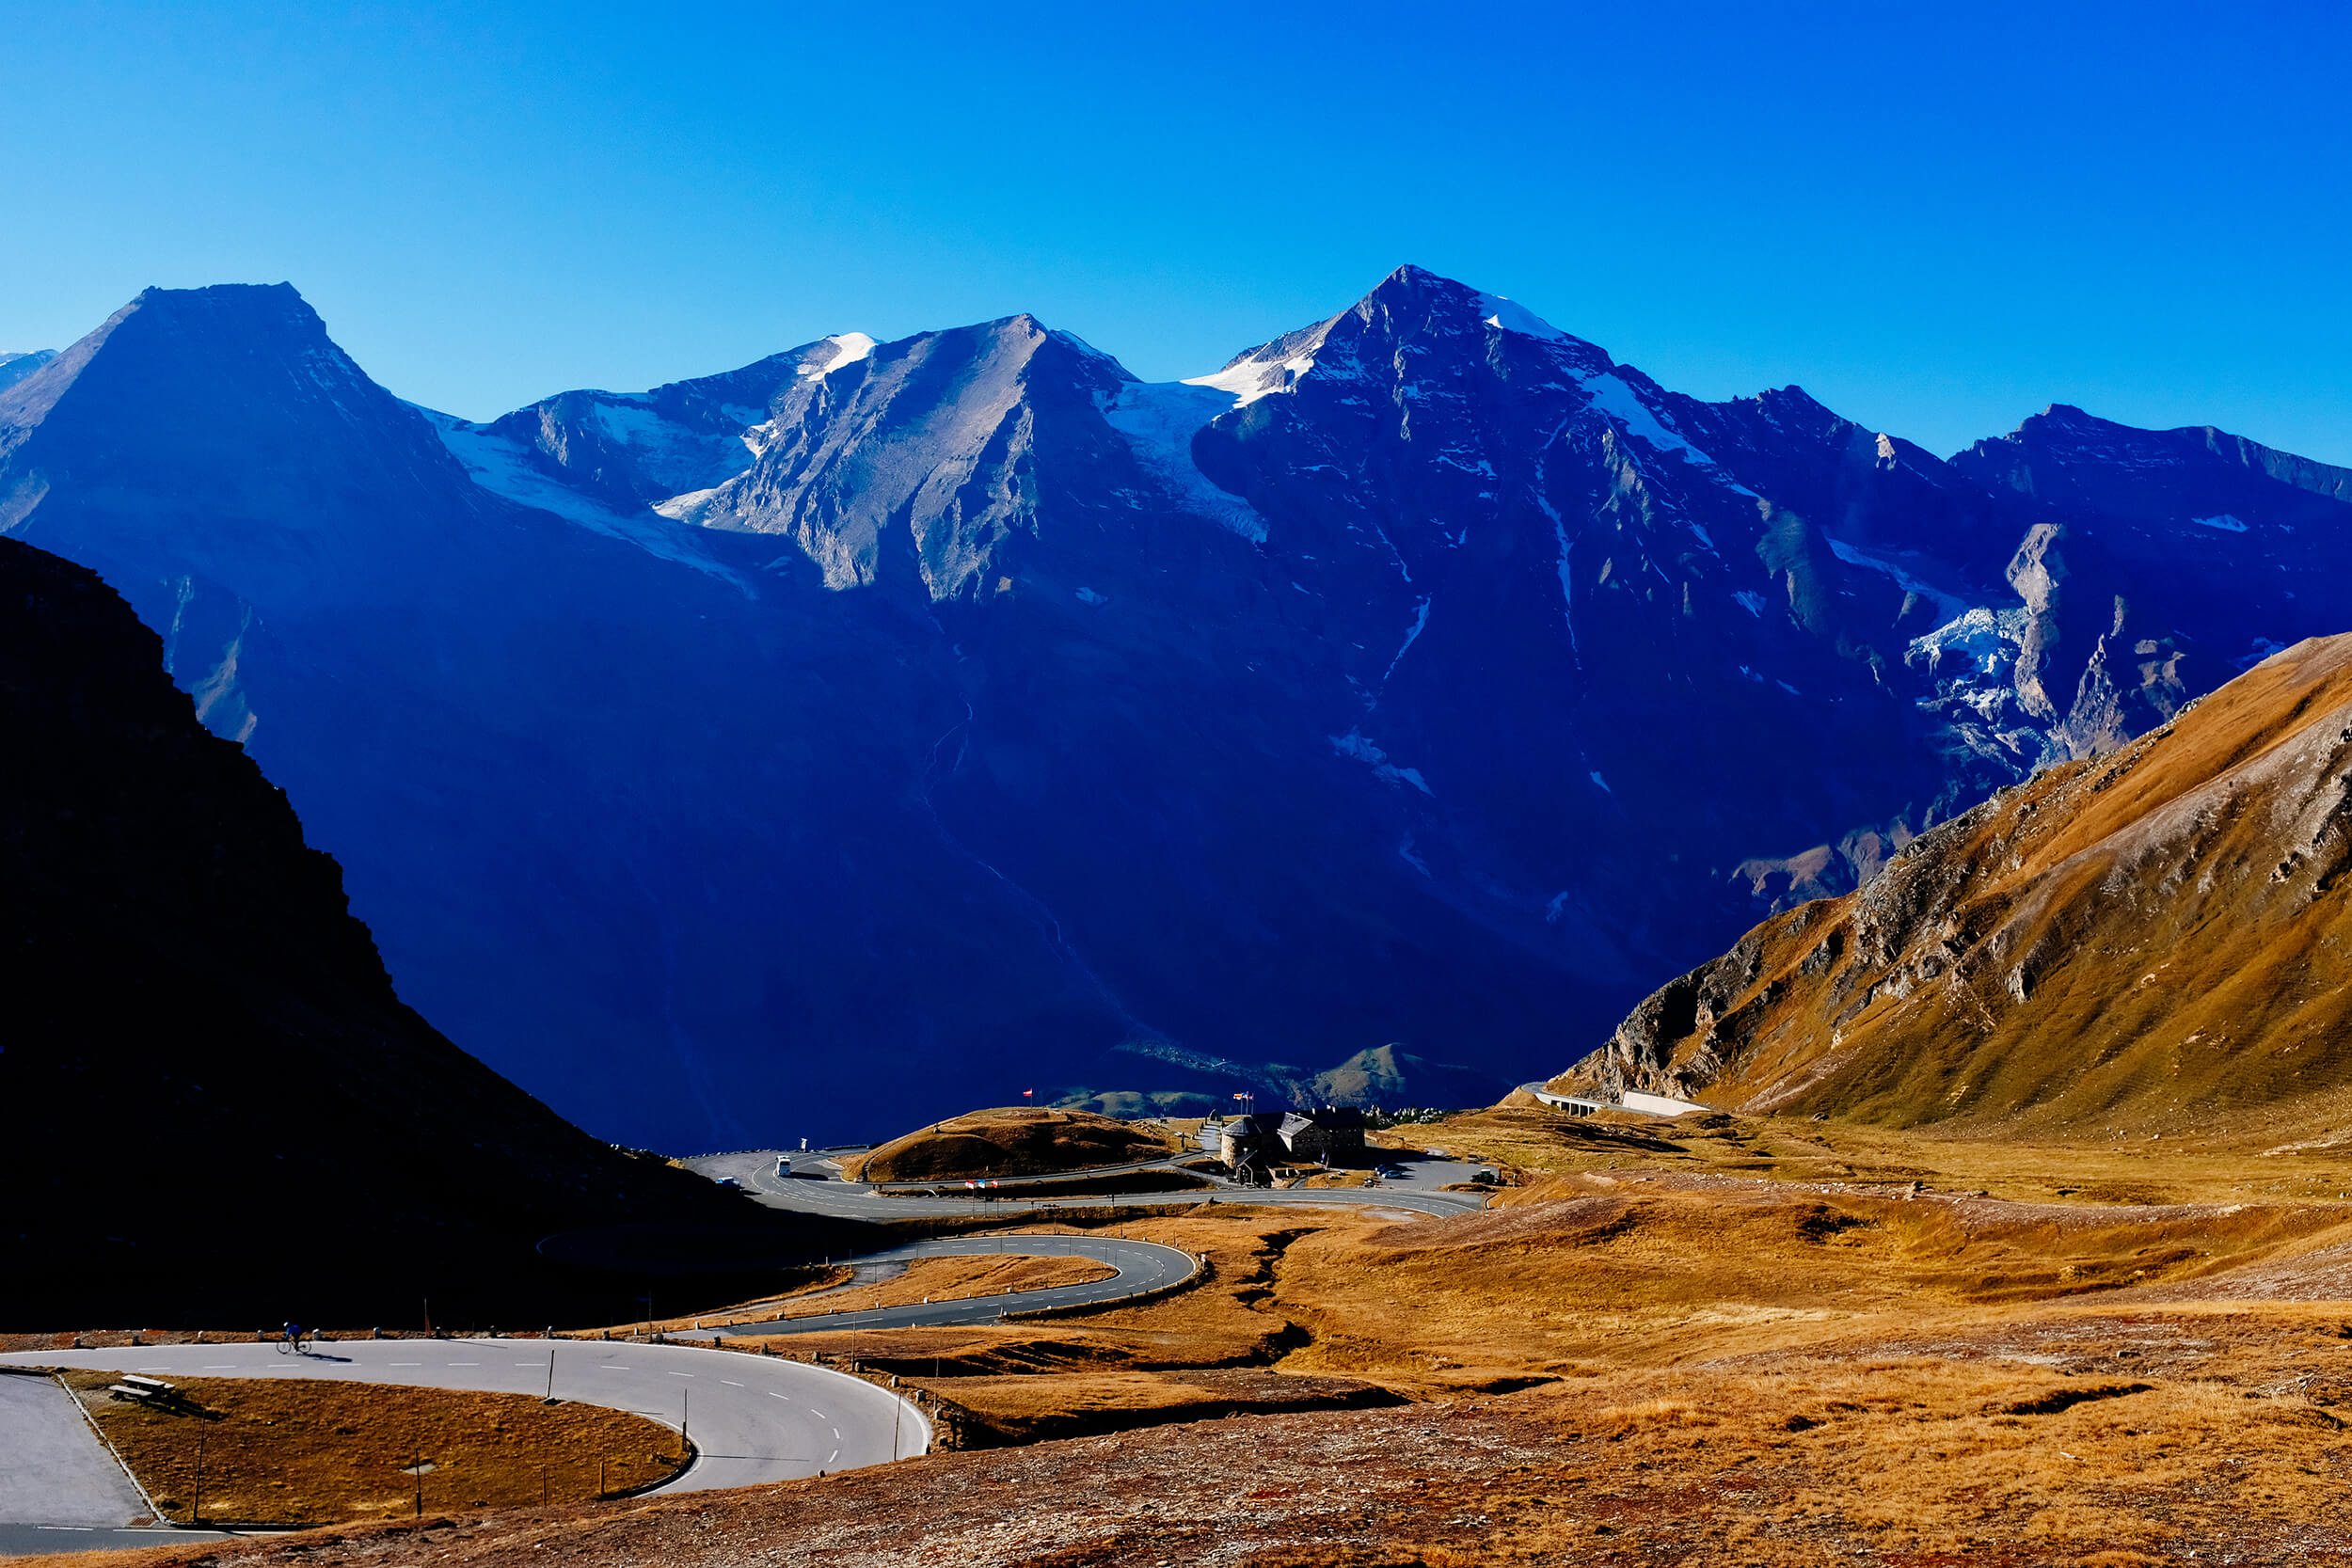 Grossglockner Austria road trip